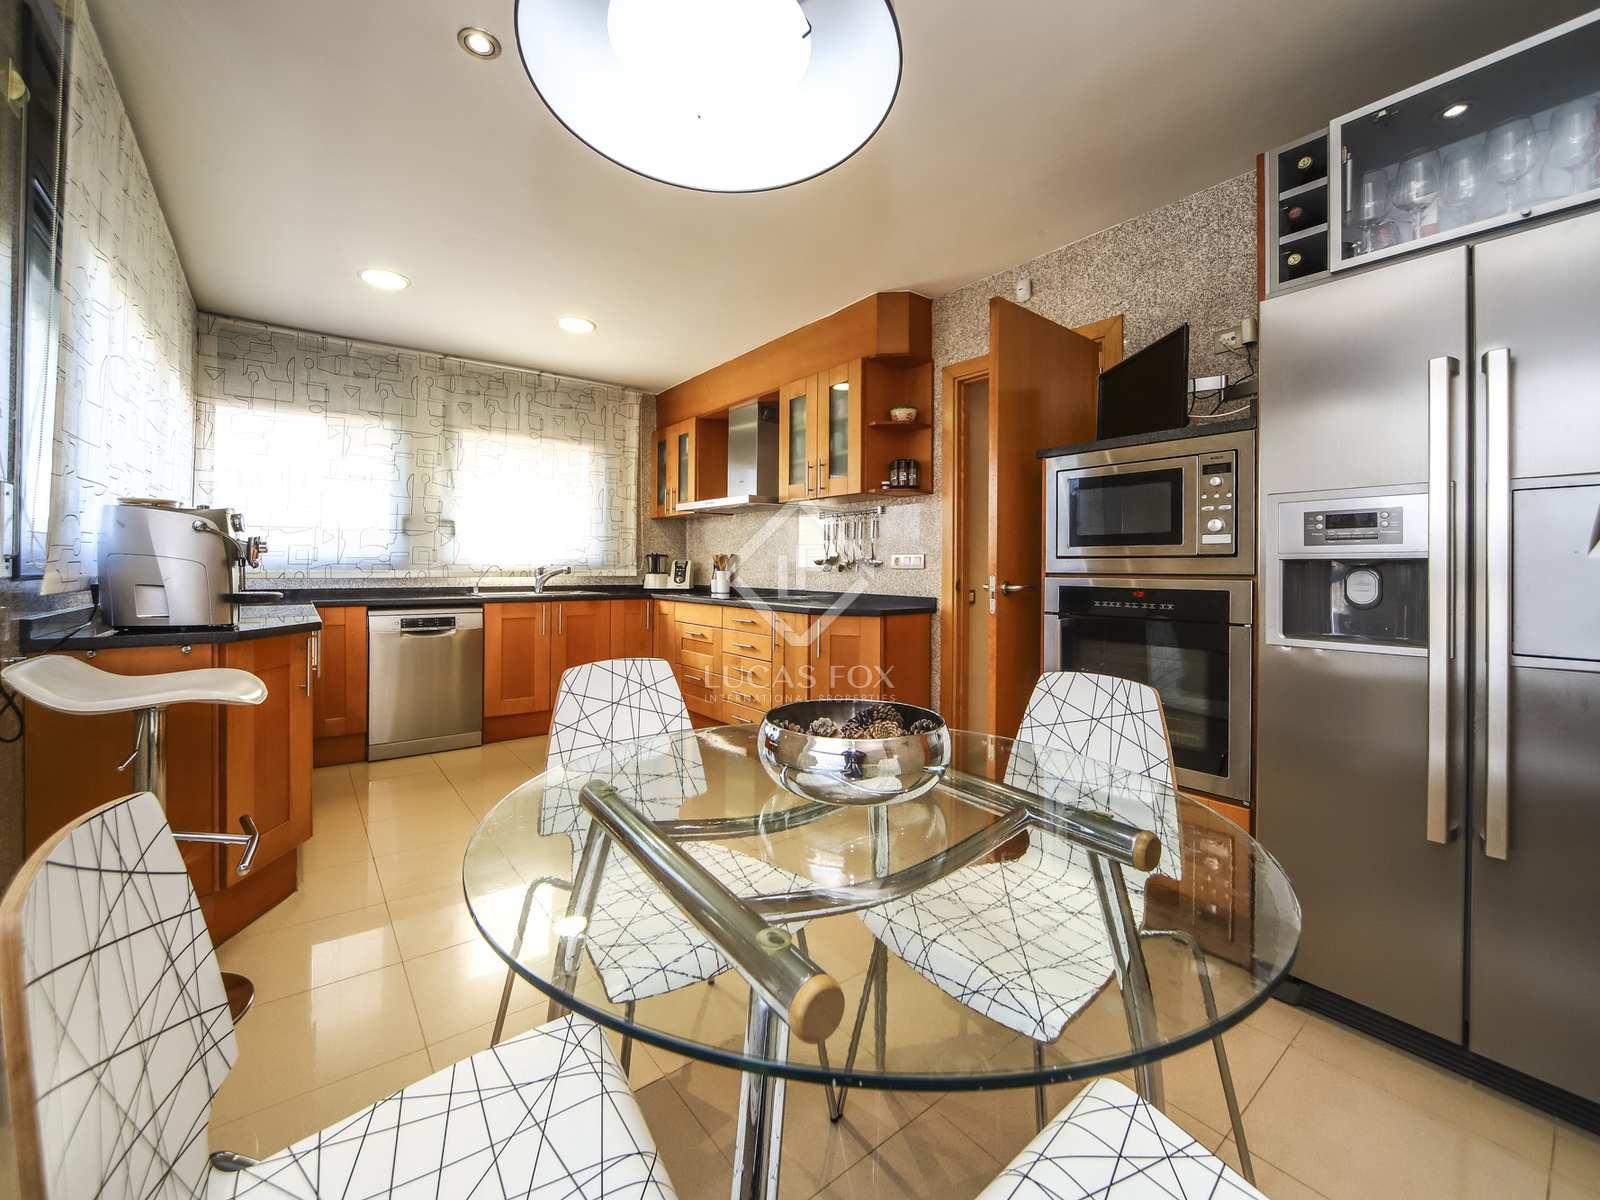 Cocina : Imagen de la vivienda